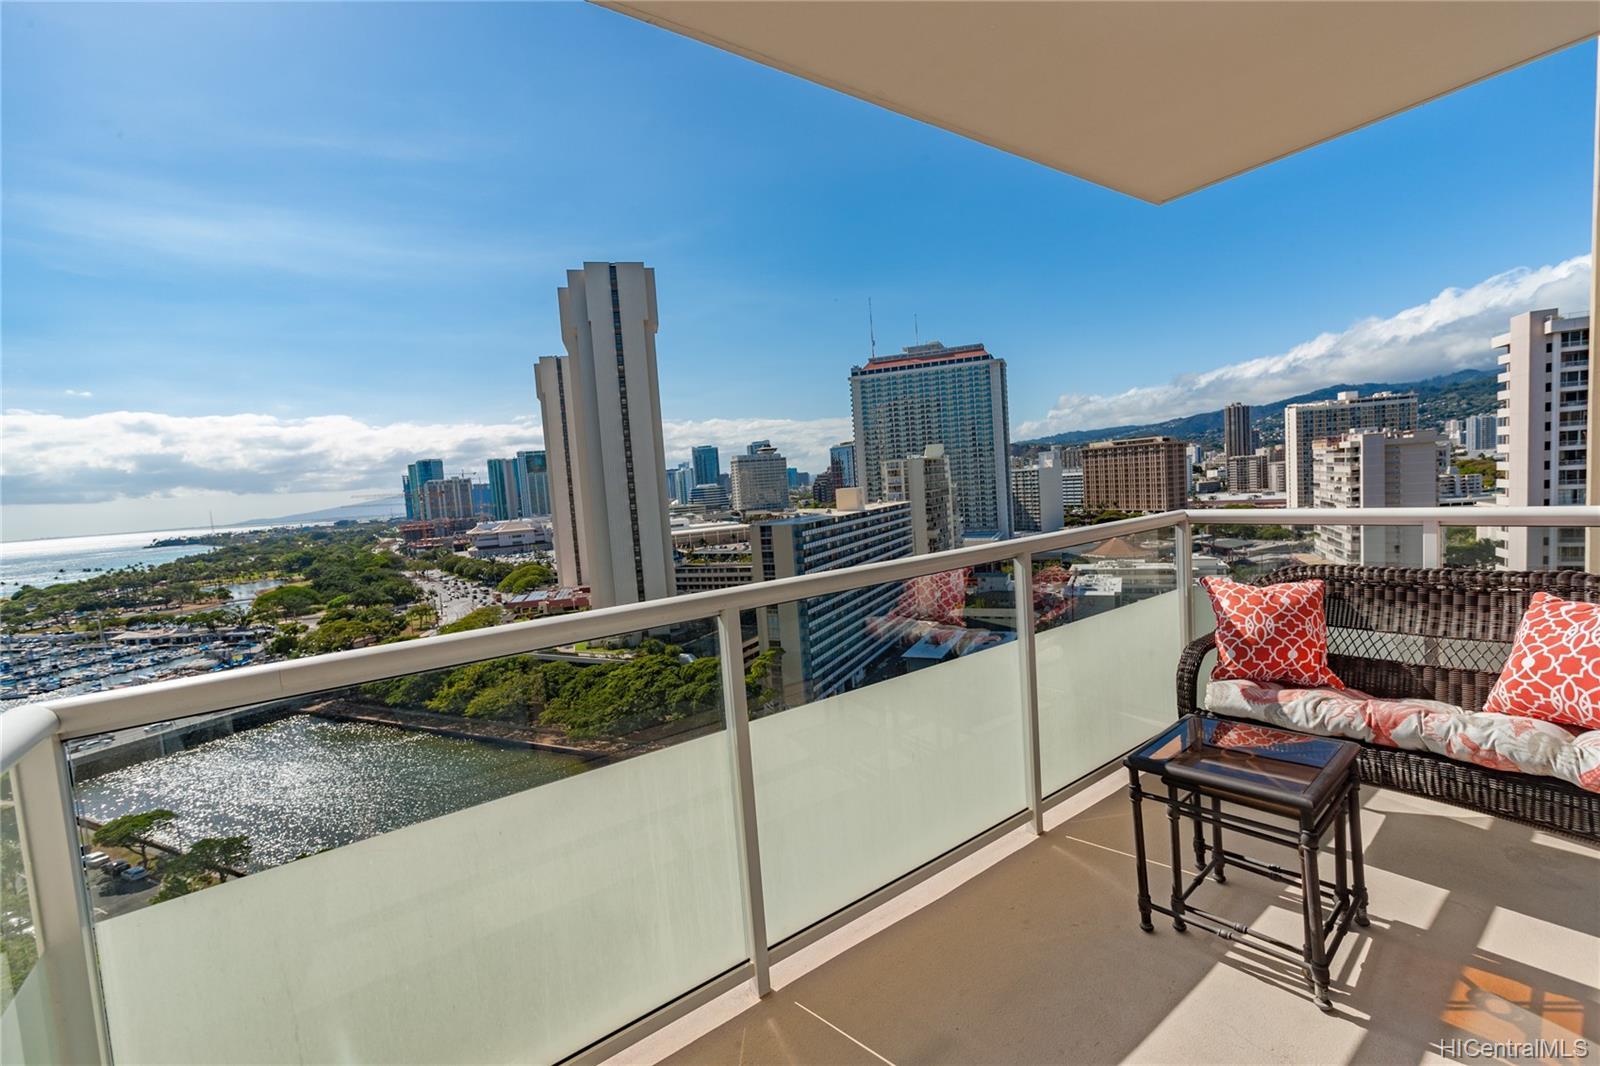 1551 Ala Wai Blvd Honolulu - Rental - photo 7 of 8